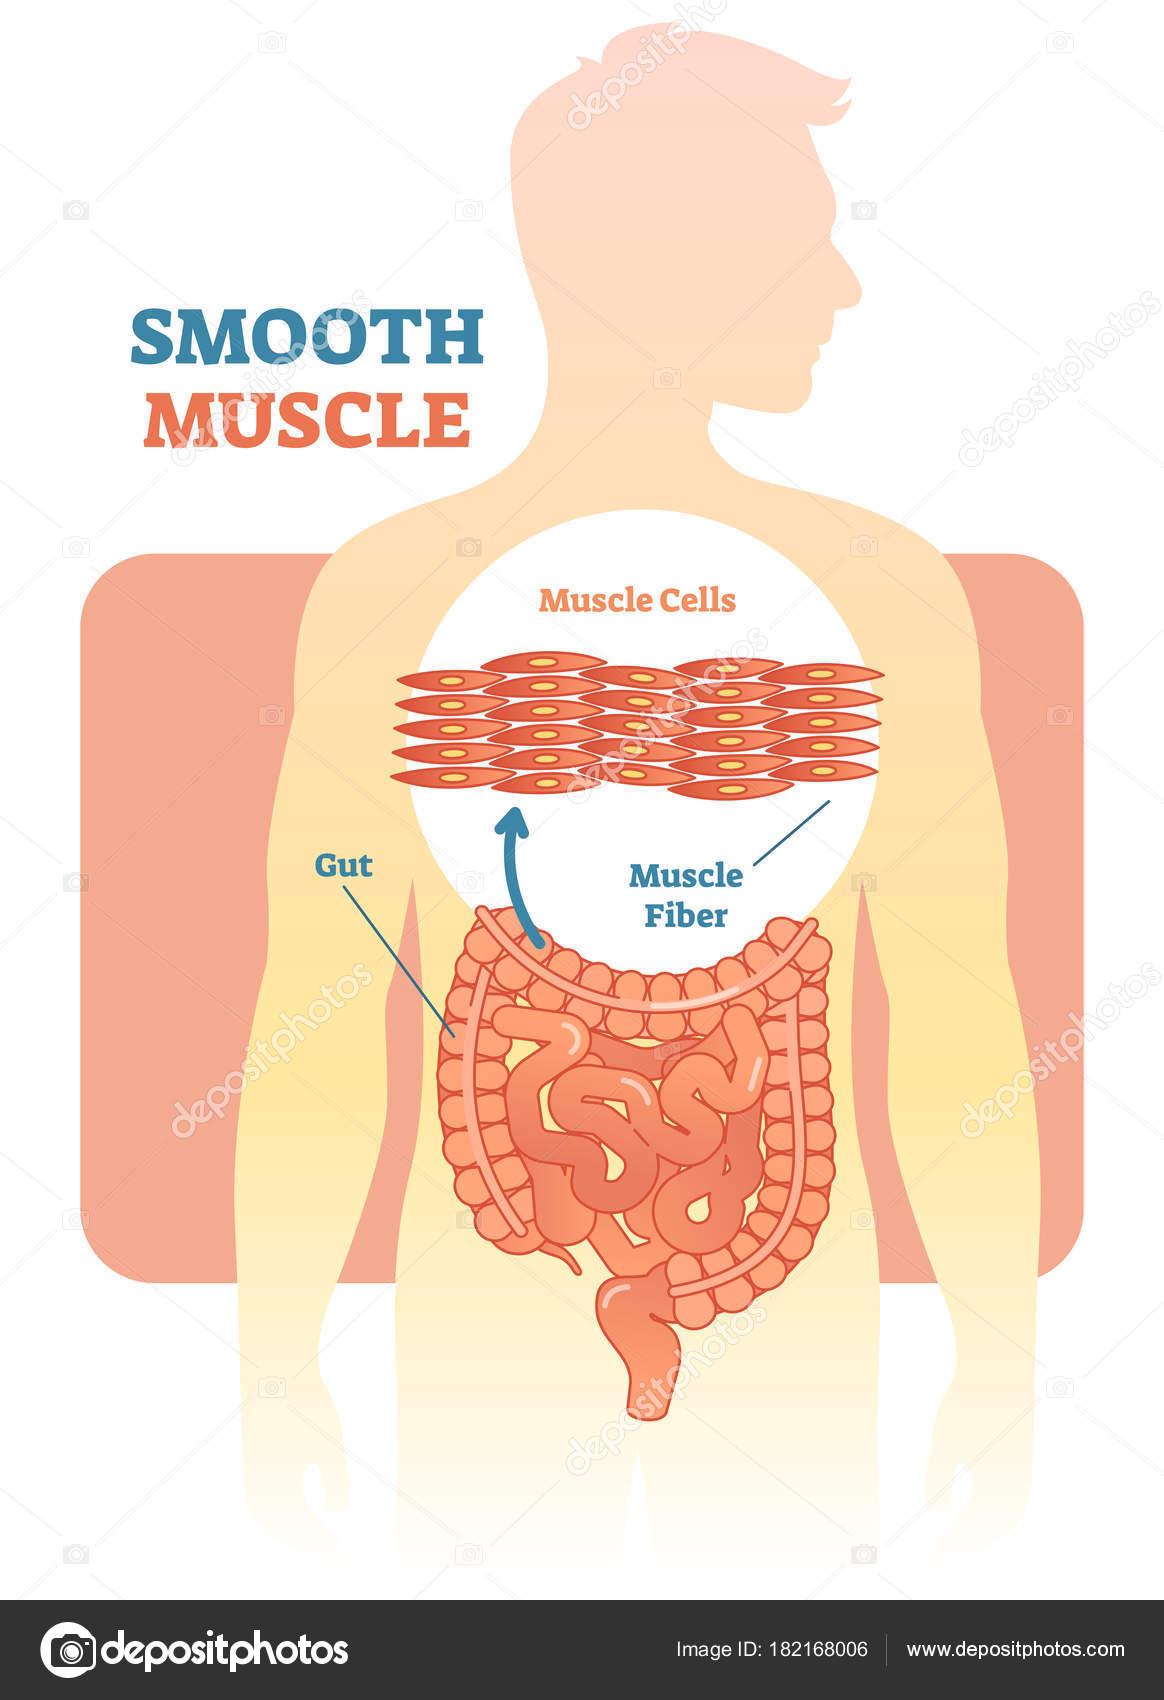 Músculo liso vector ilustración diagrama esquema anatómico con ...